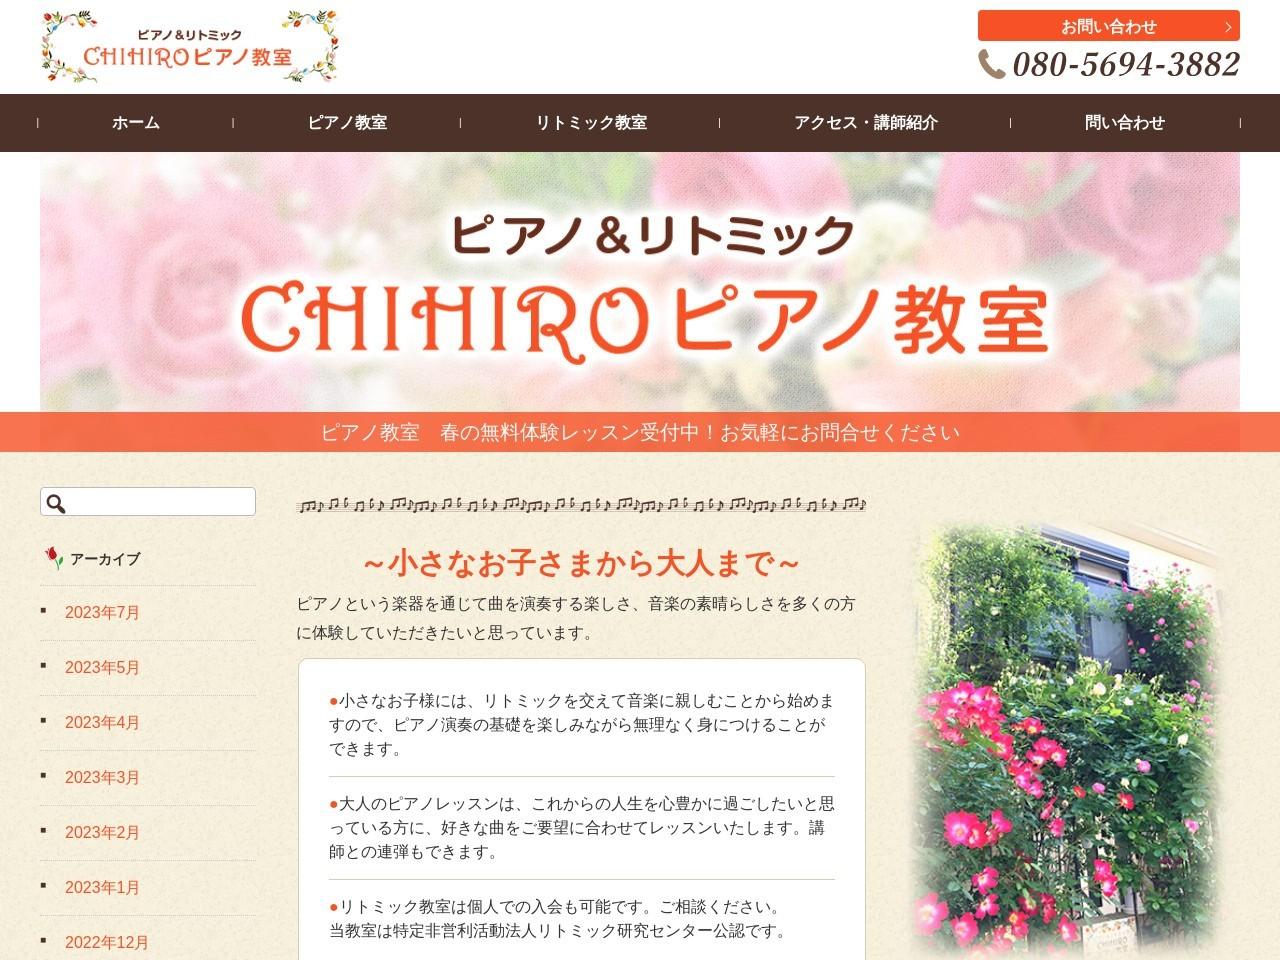 CHIHIROピアノ教室のサムネイル